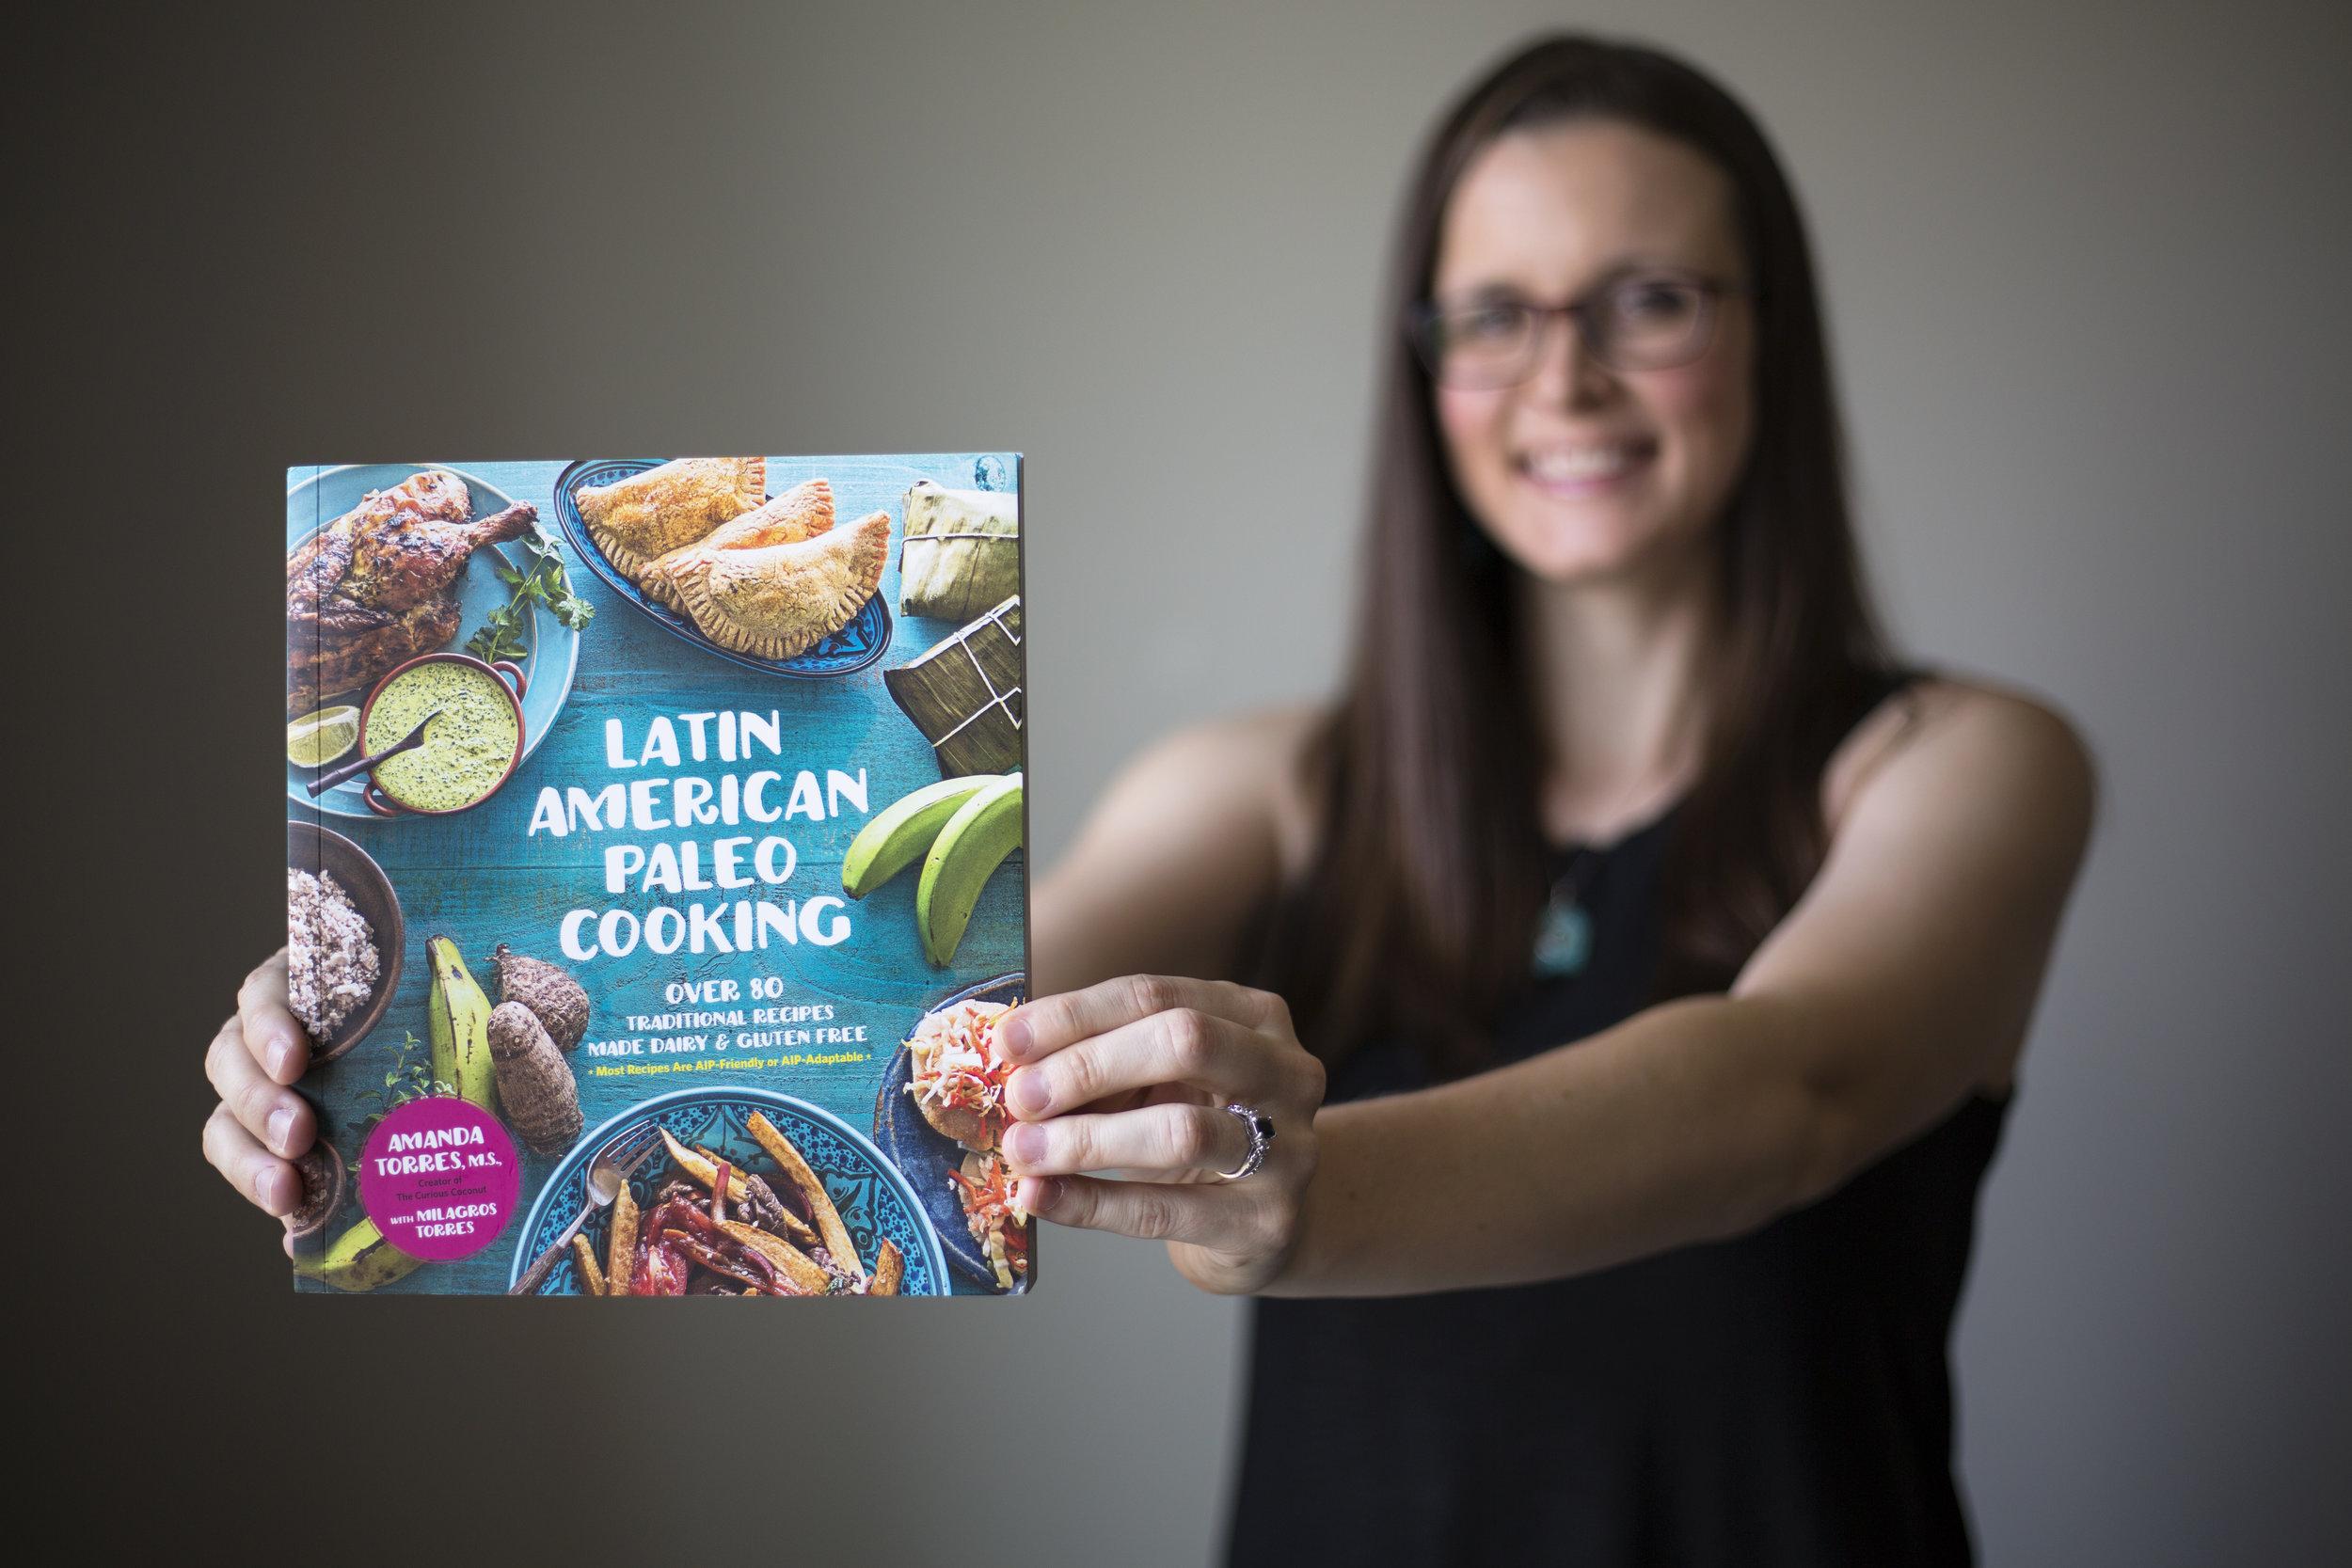 latin american paleo cooking by amanda torres